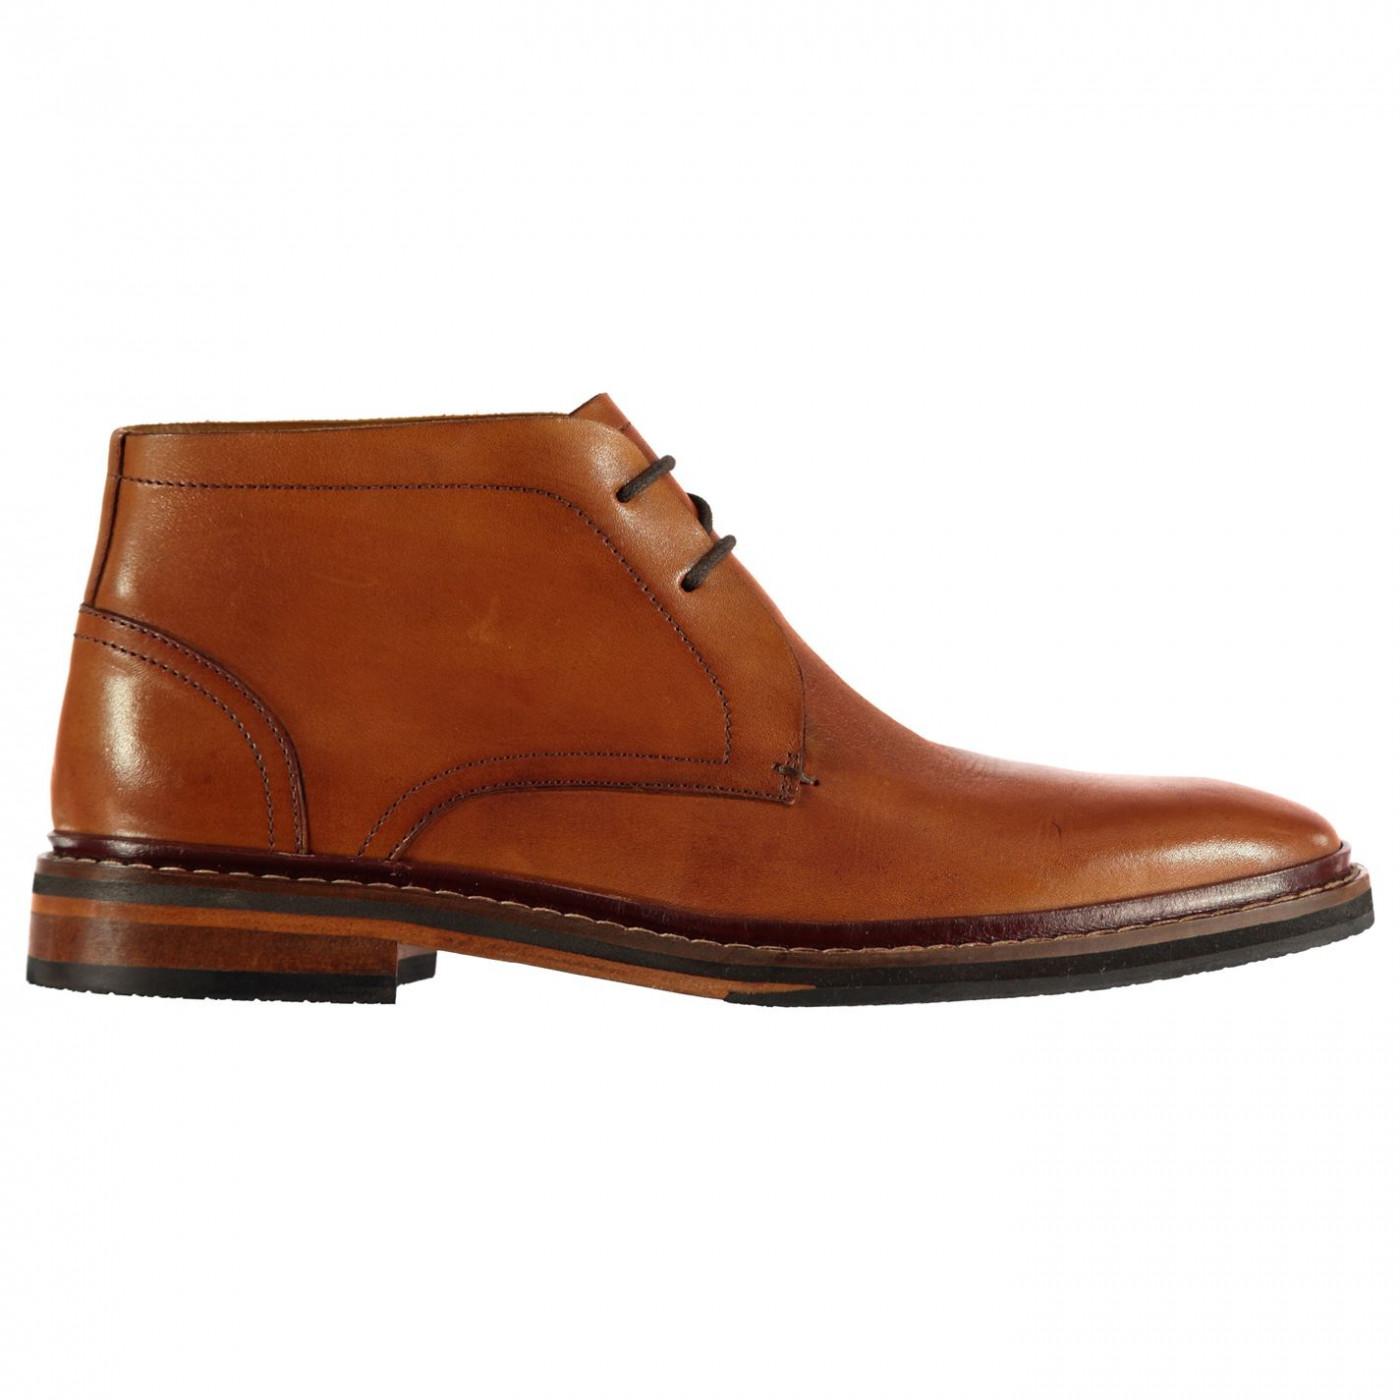 Firetrap Blackseal Buckland Boots